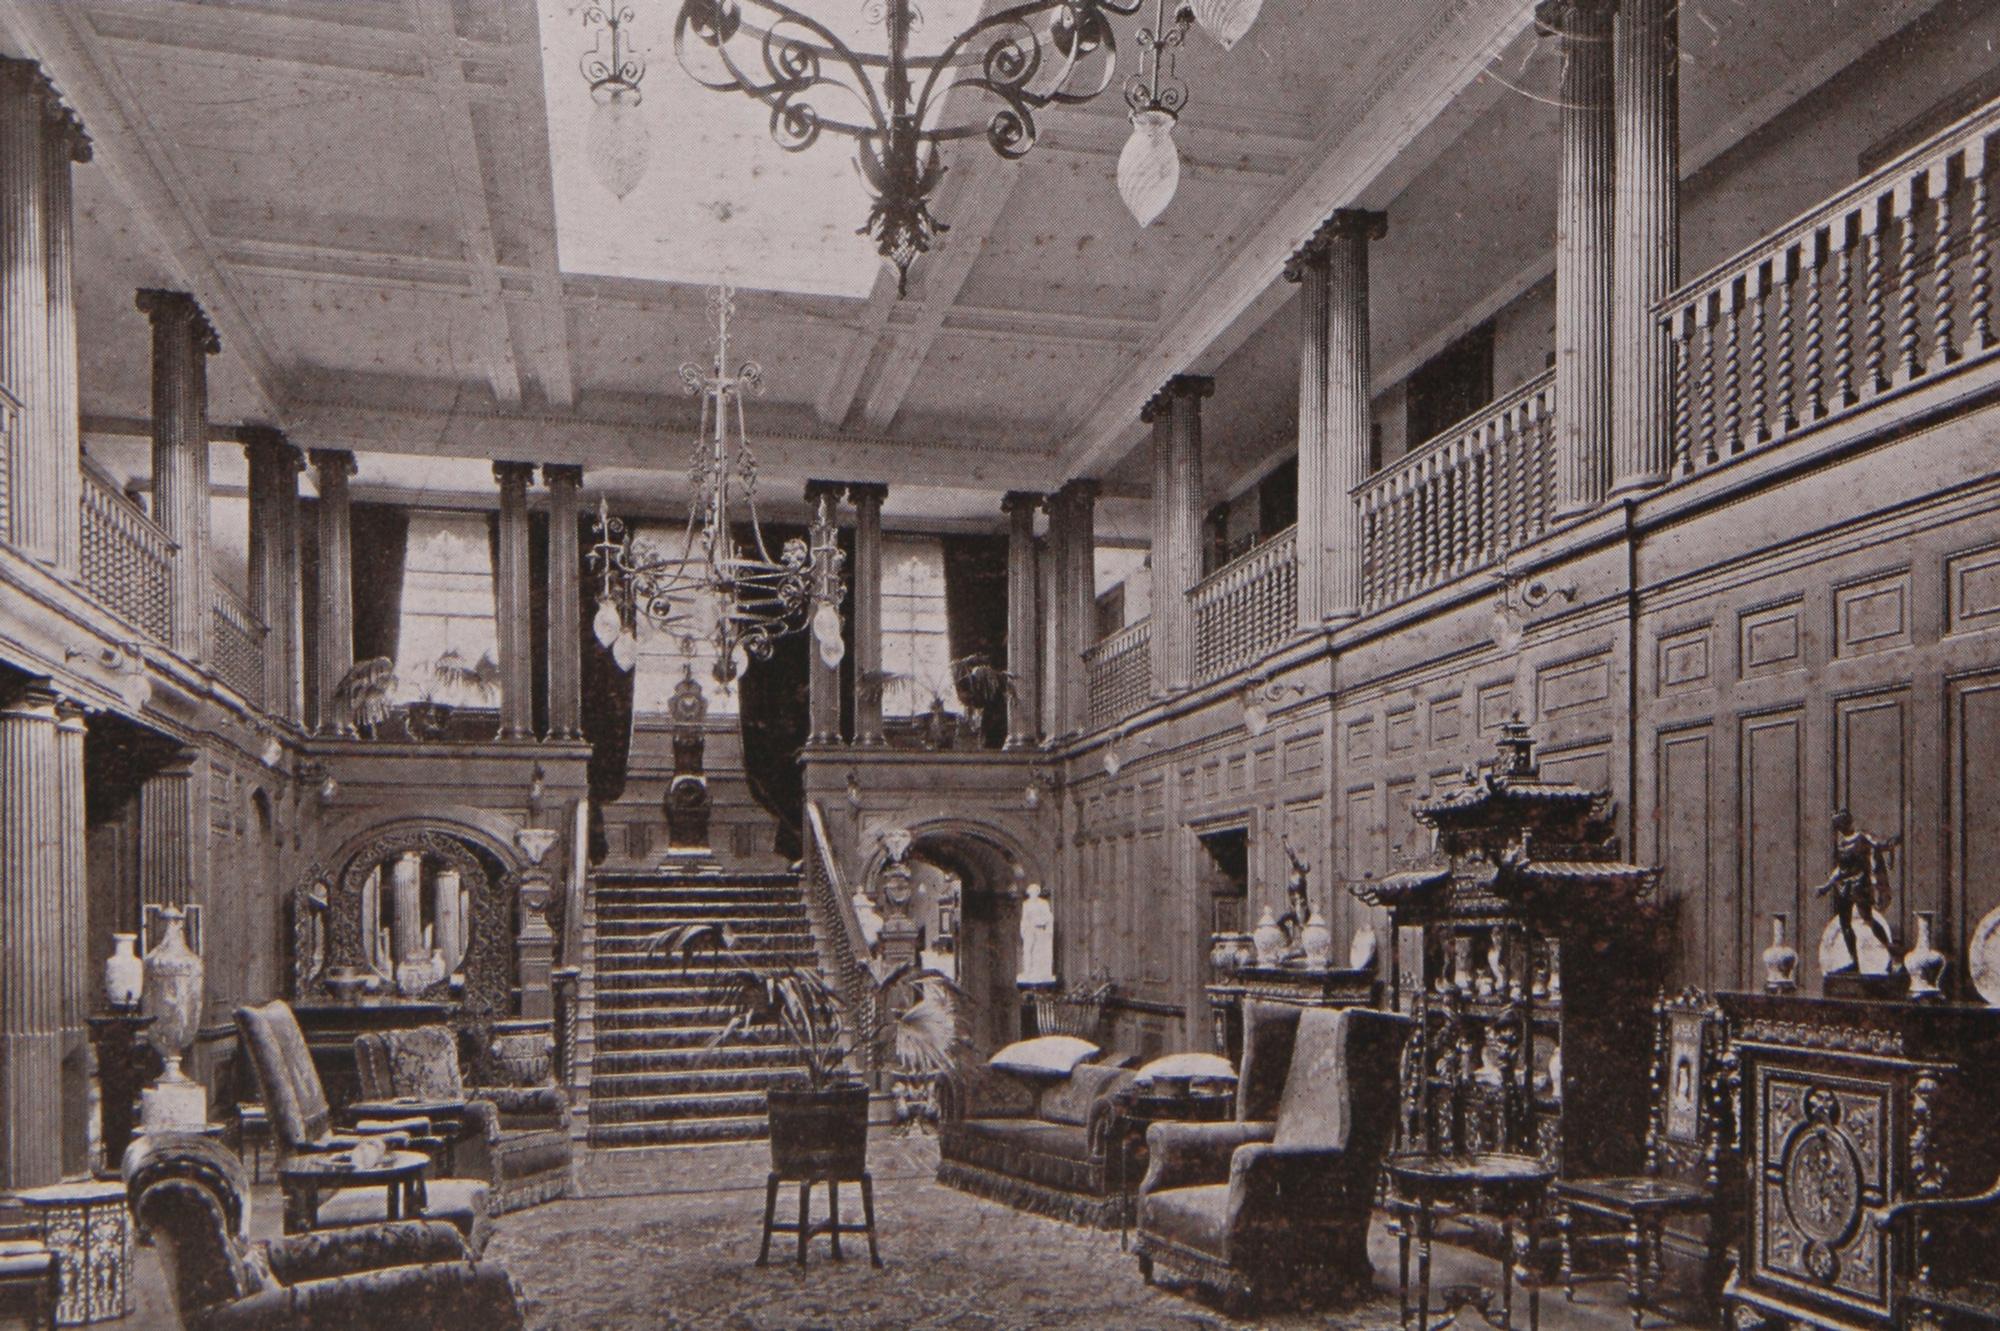 Addington Park interior the Hall